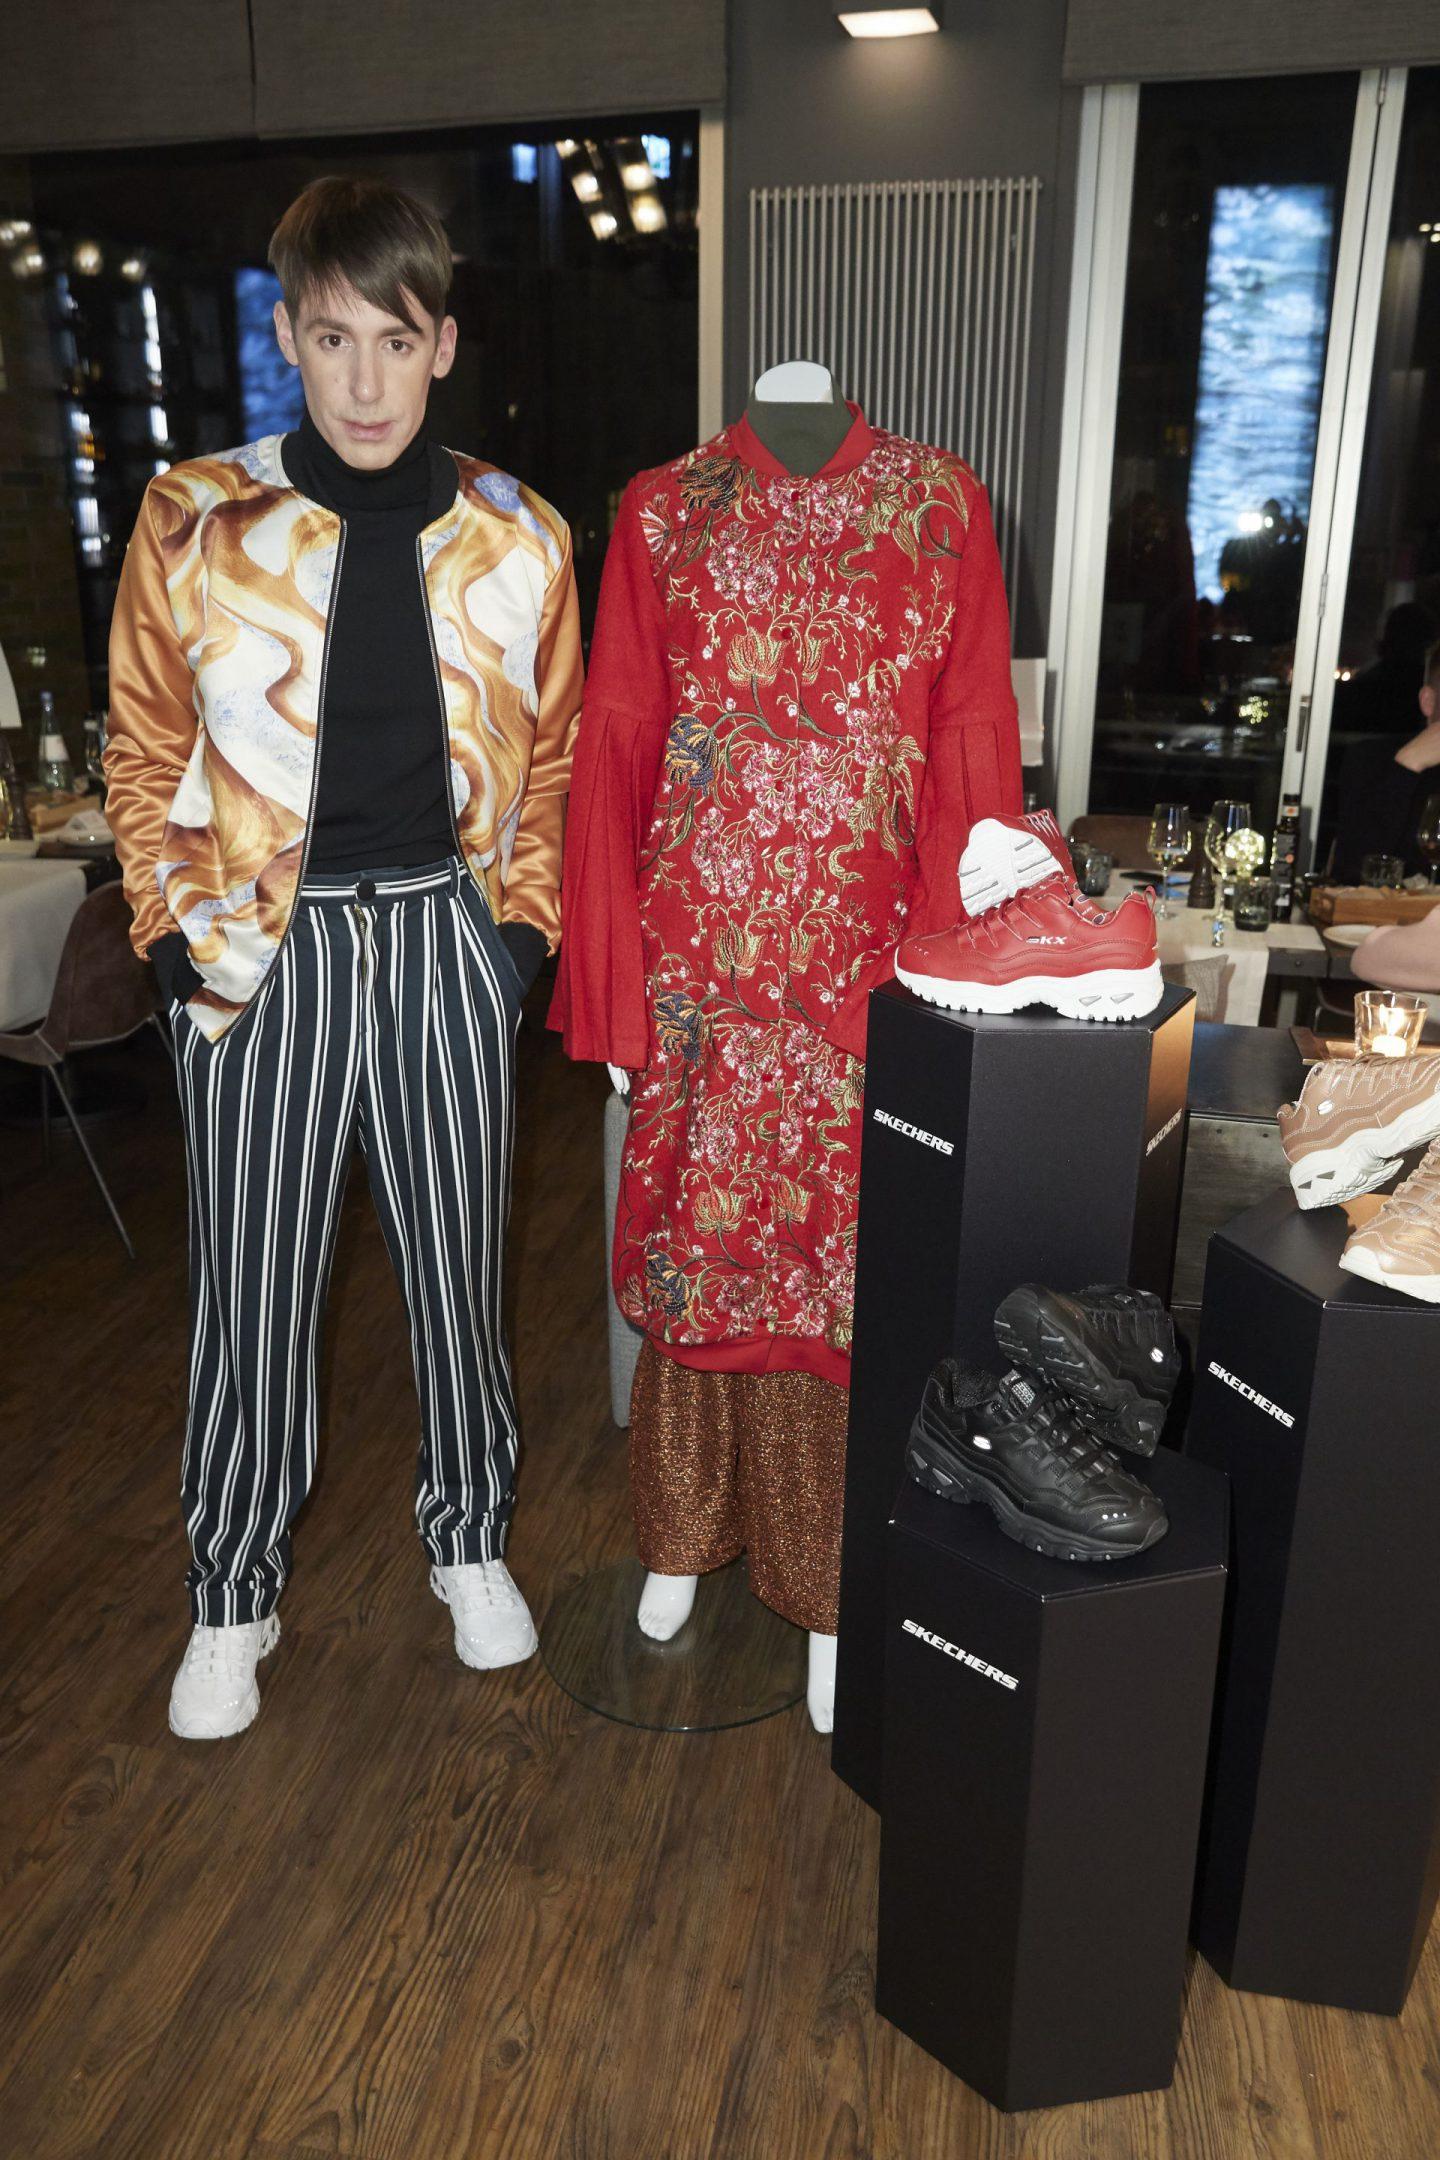 Instyle meets Skechers Kilian Kerner + Outfit 2